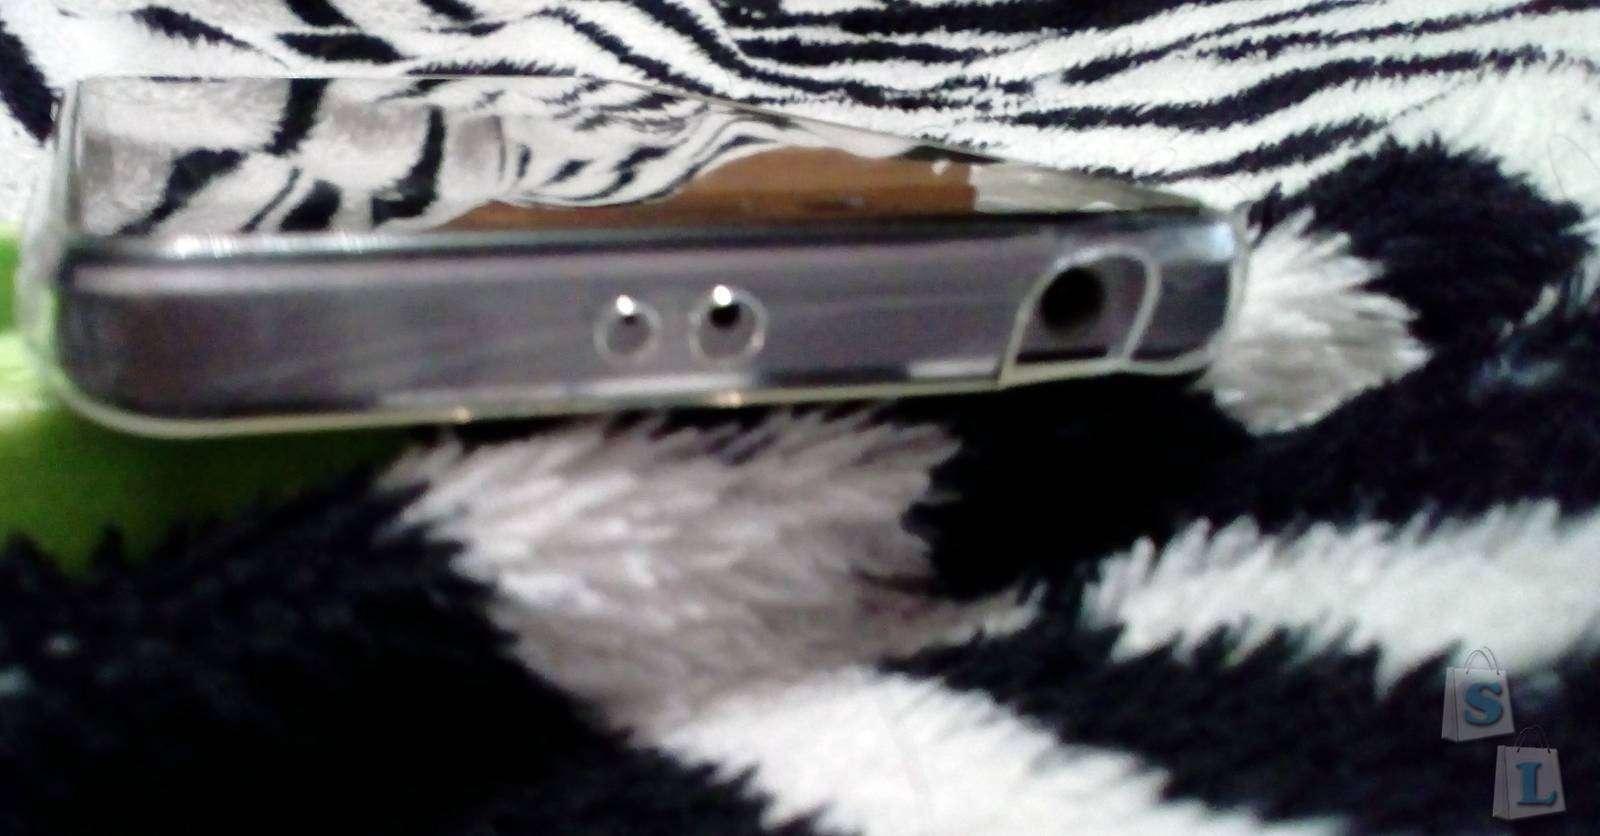 Aliexpress: Прозрачный чехол для Xiaomi Redmi 4 Pro / Prime